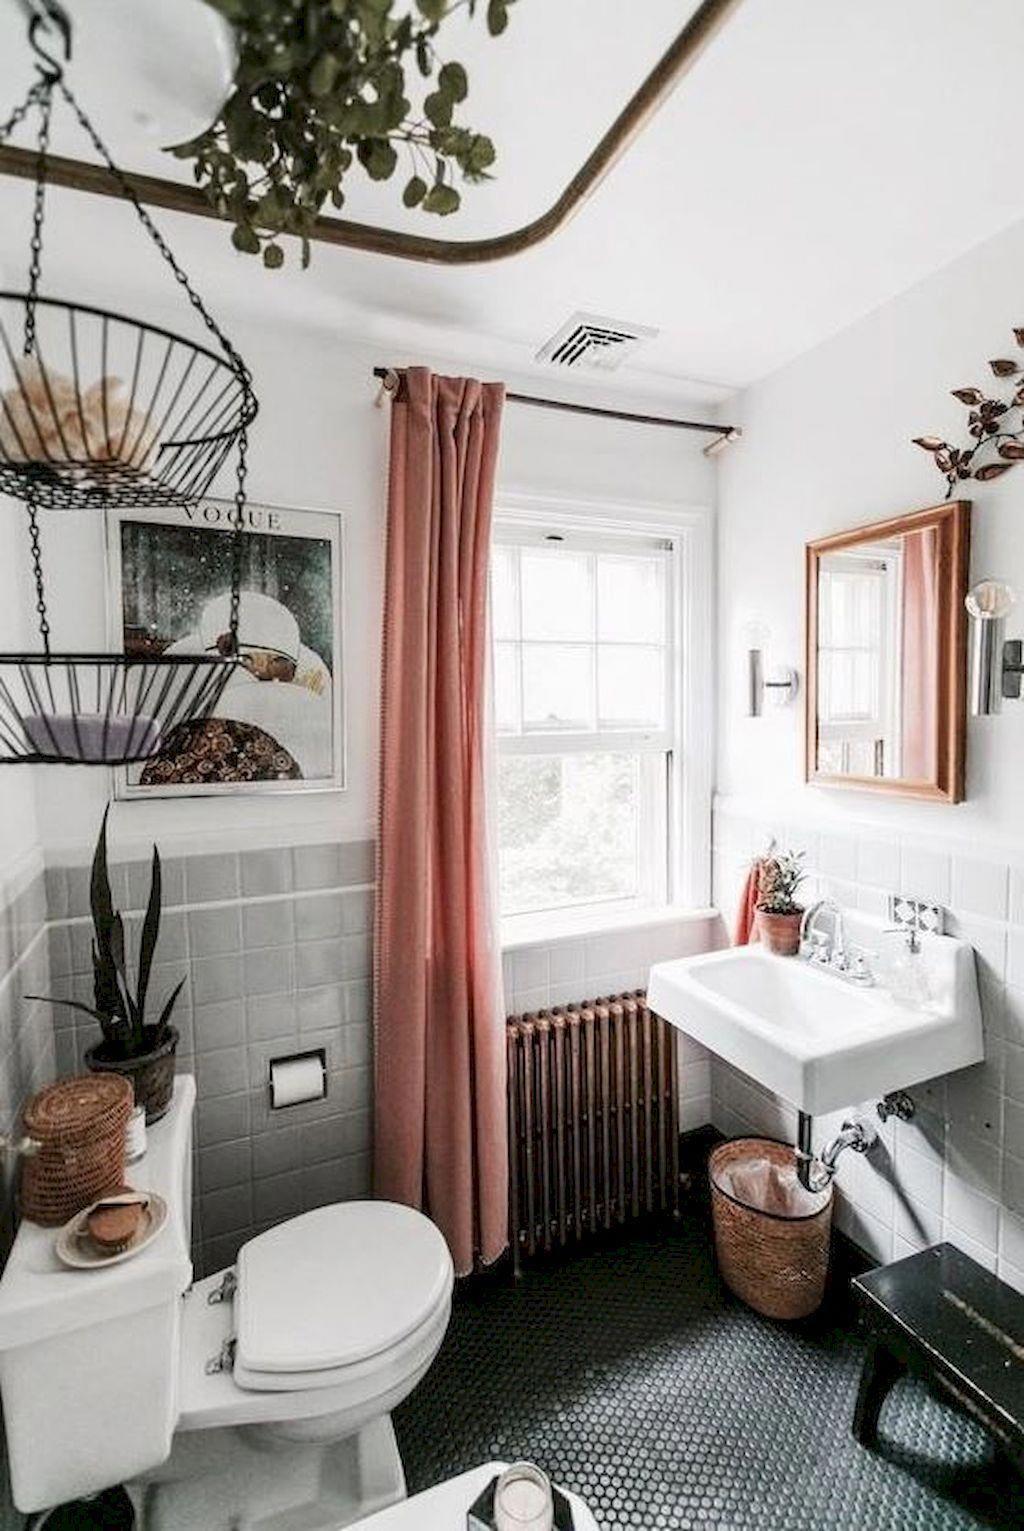 Gorgeous 85 Beautiful Small Bathroom Decor Ideas on A Budget ...